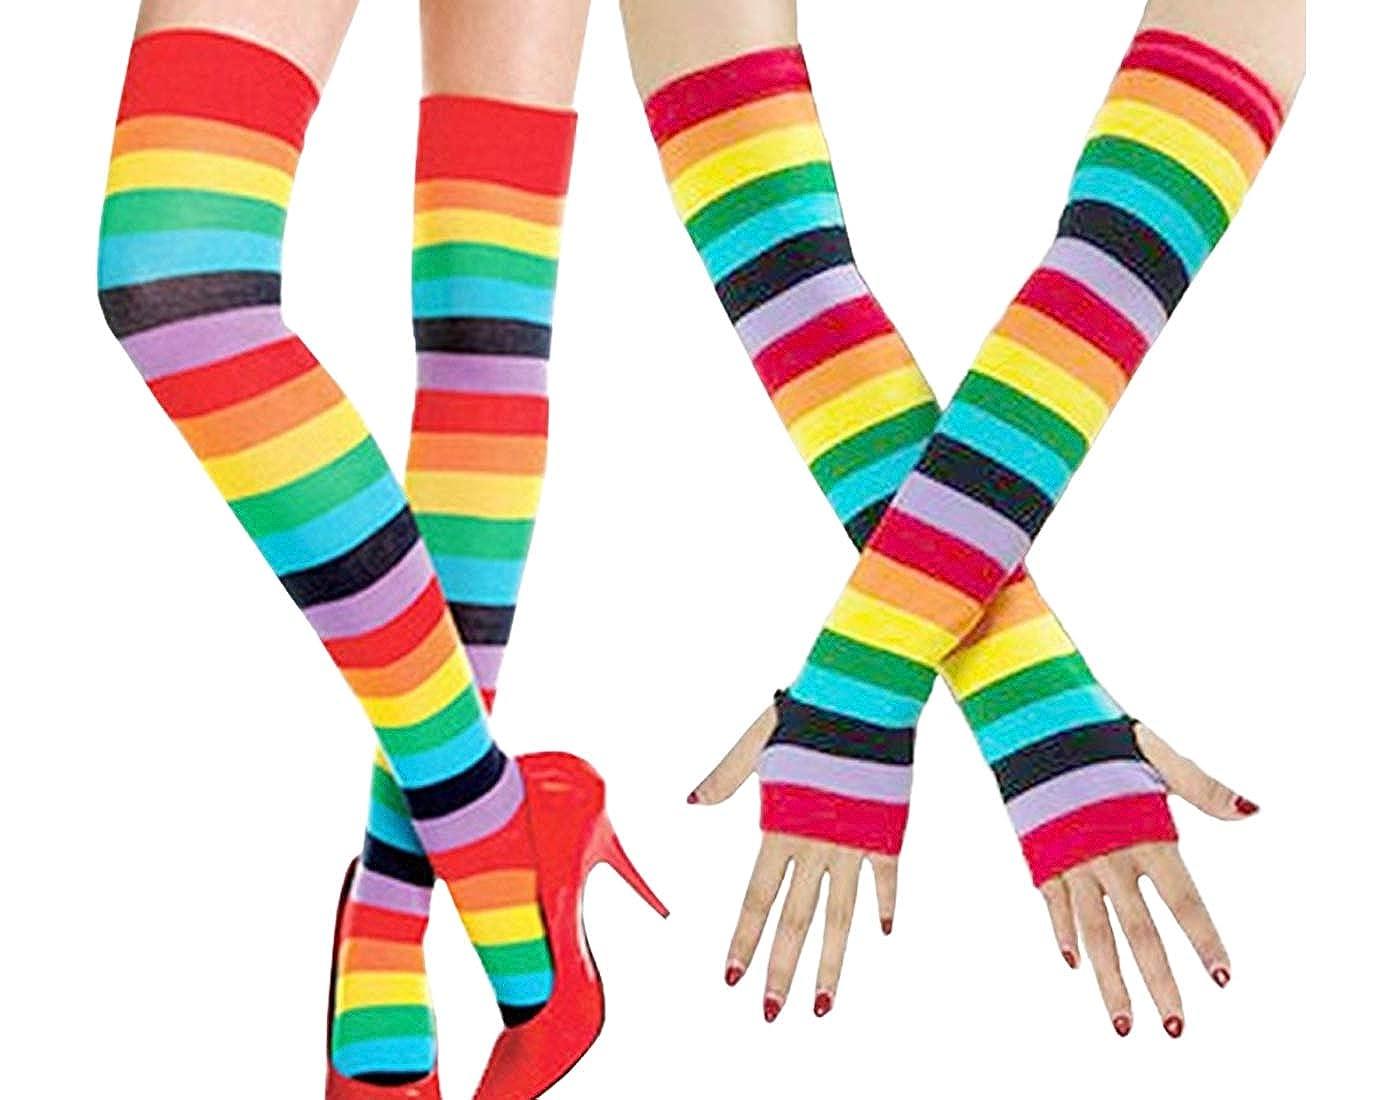 Artown Women High Compression Socks Cute Stripes Leg Warmer - Thigh Socks Sets Party Cosplay Halloween